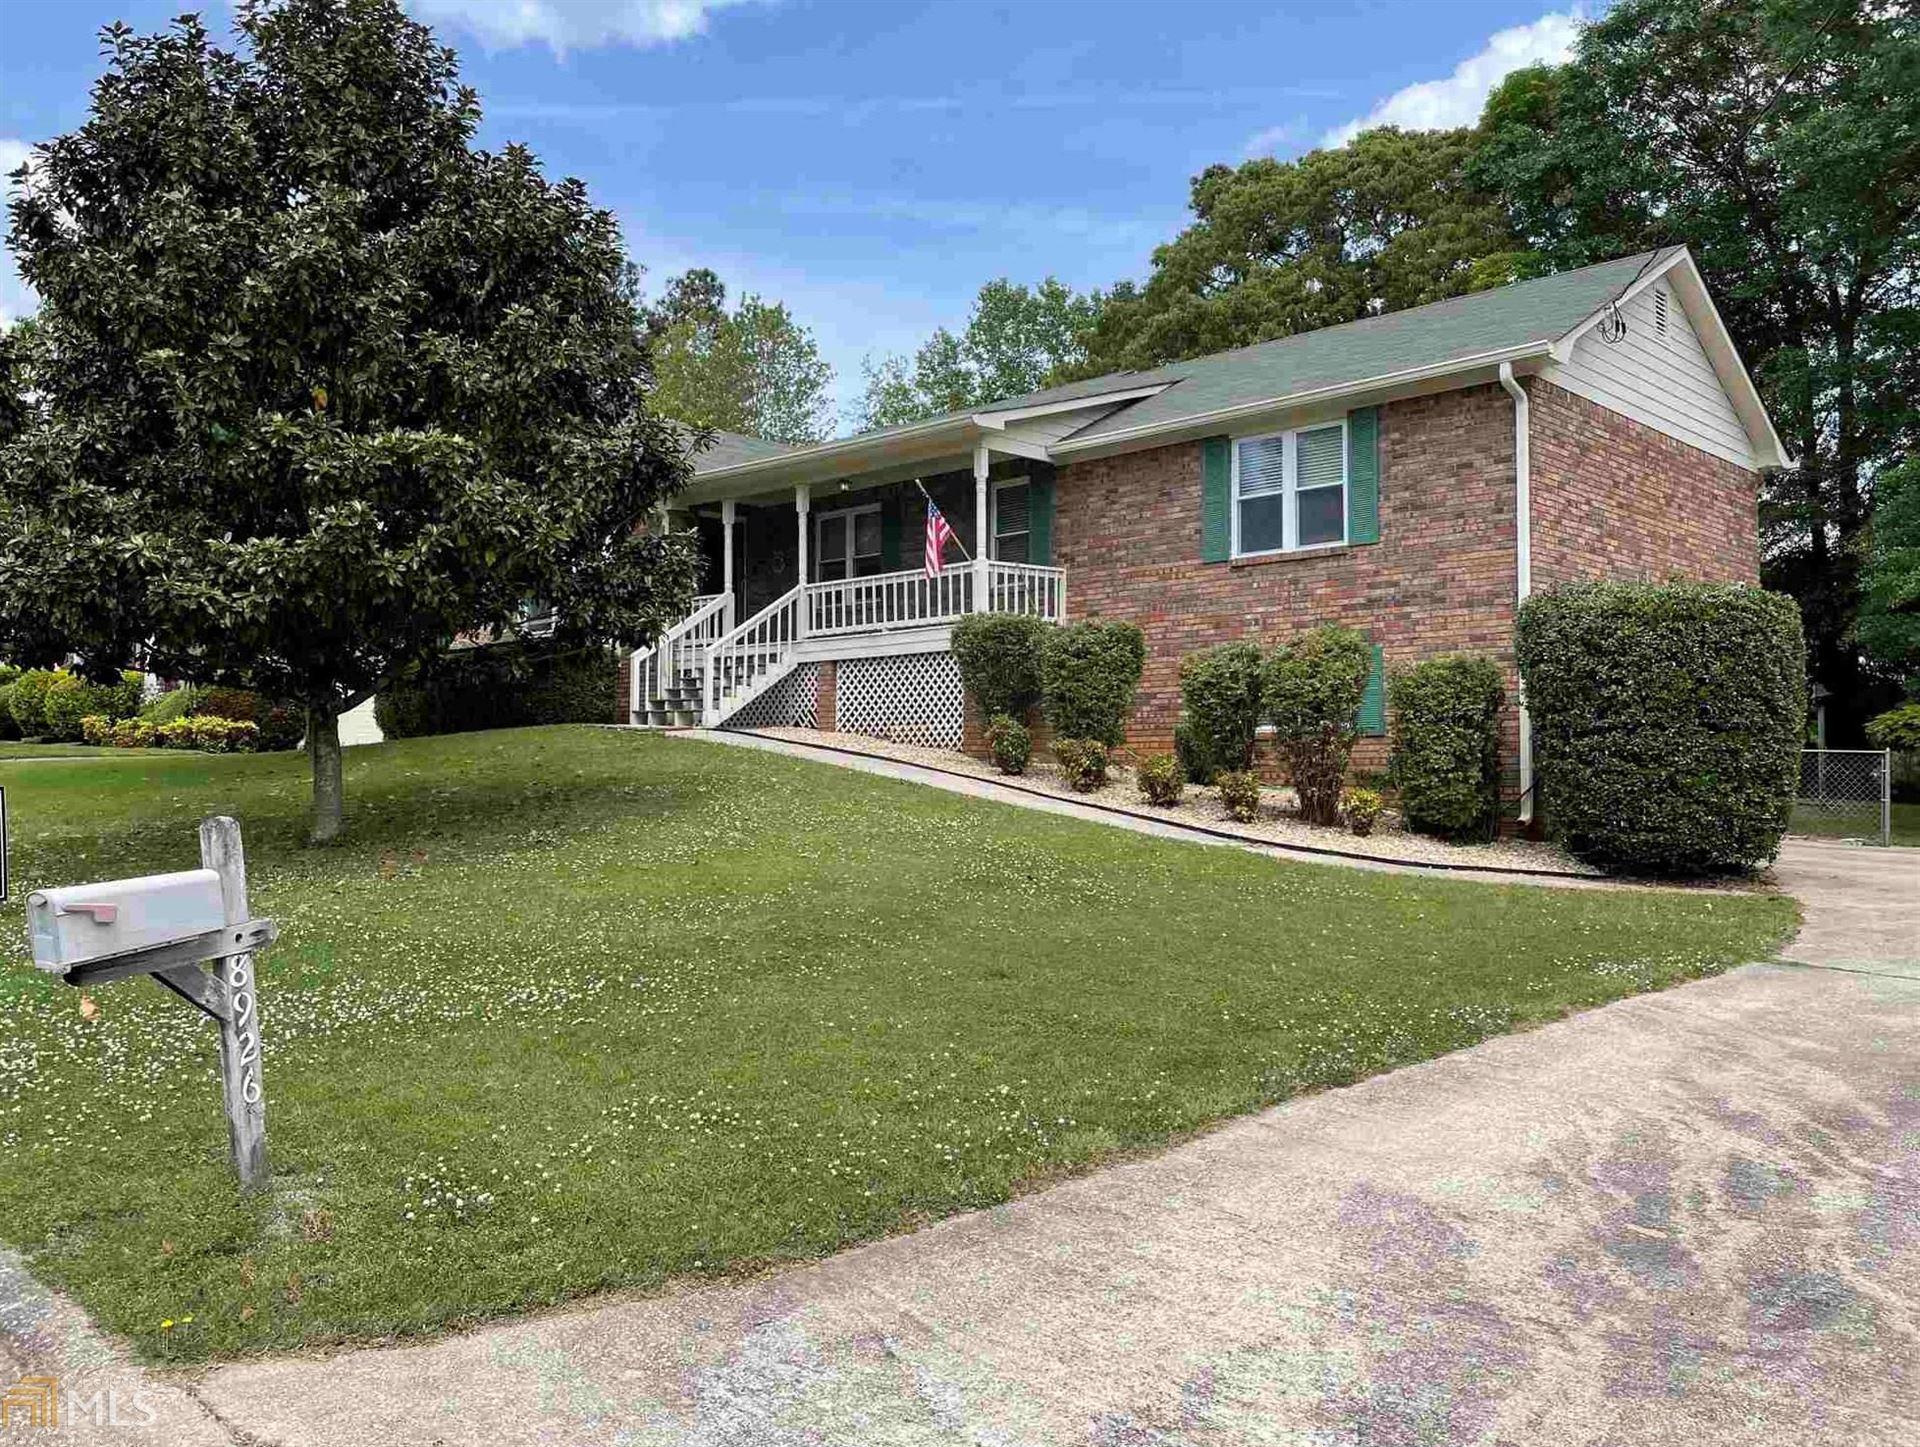 8926 Western Pines Dr, Douglasville, GA 30134 - #: 8968258